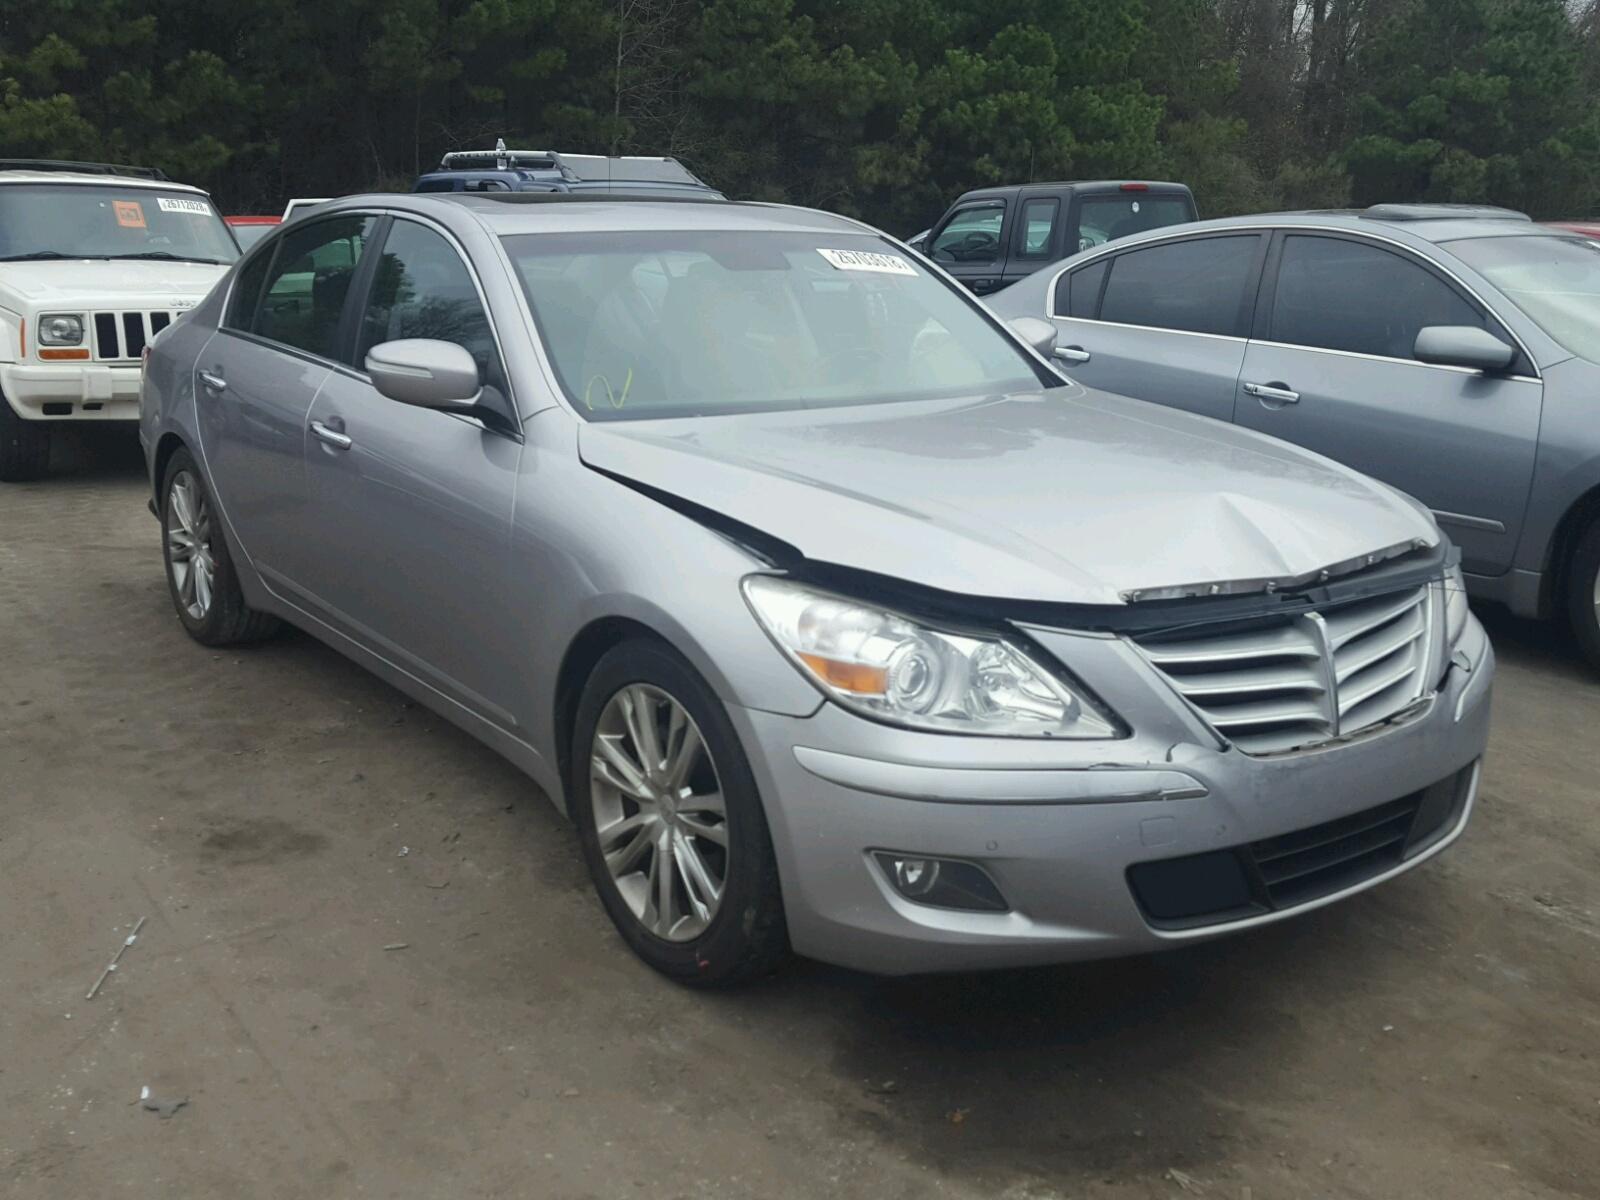 Auto Auction Ended On Vin 5npdh4ae1dh398436 2013 Hyundai